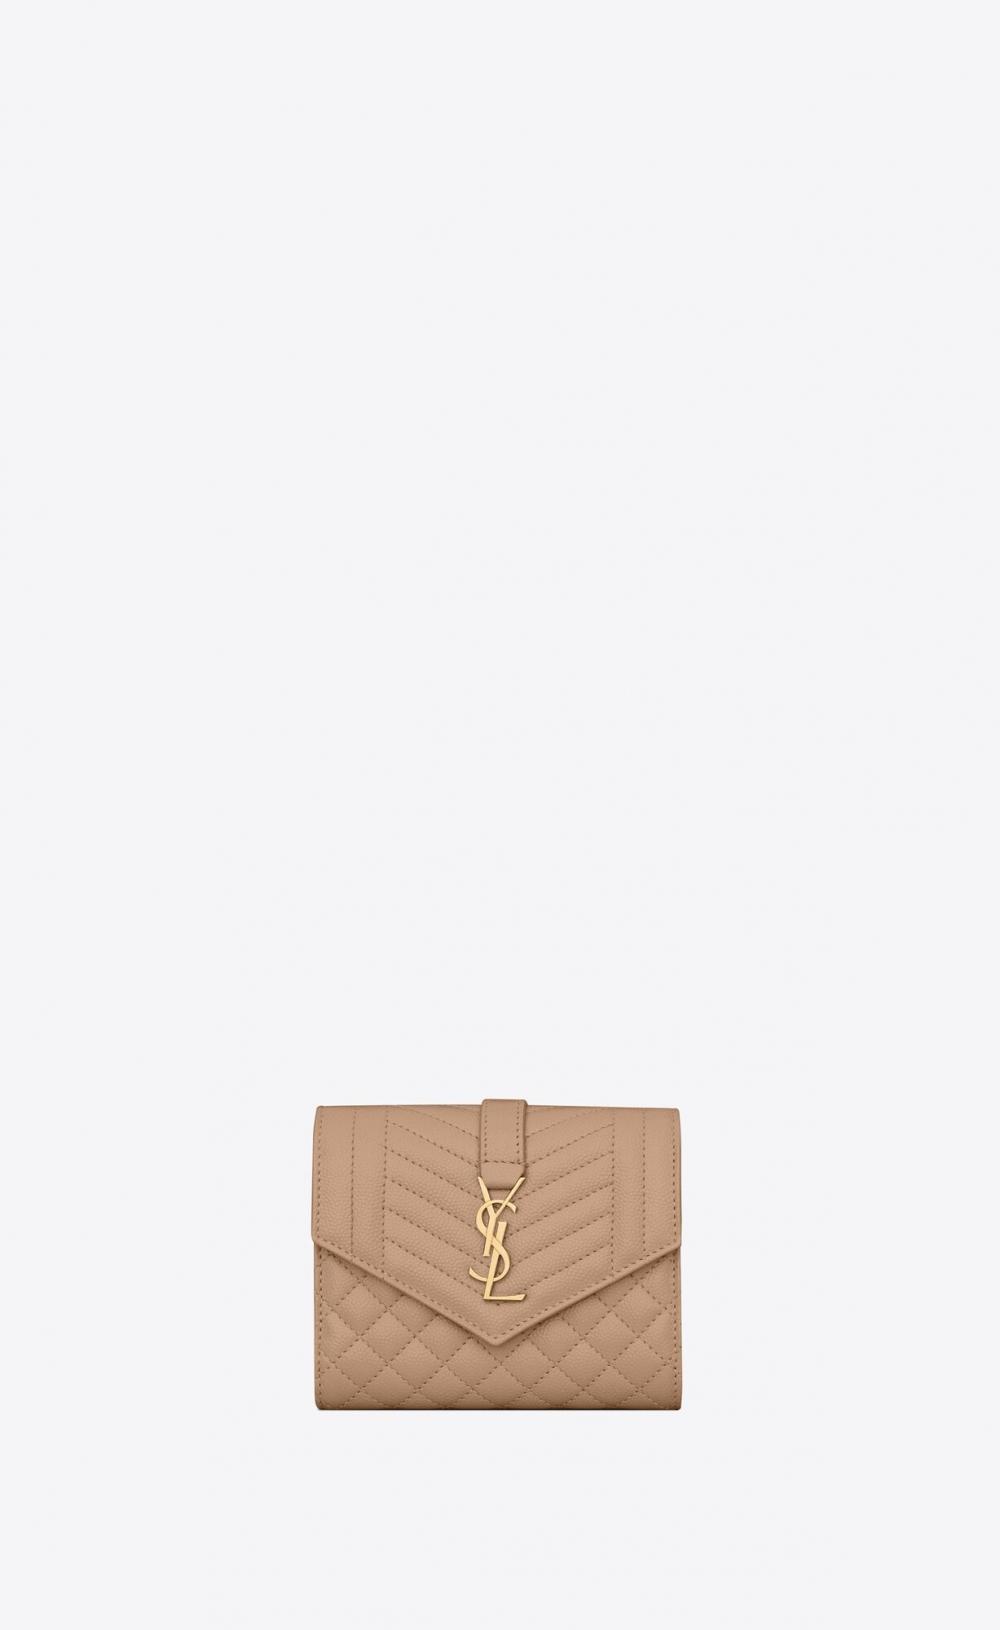 Saint Laurent Monogram Compact Tri Fold